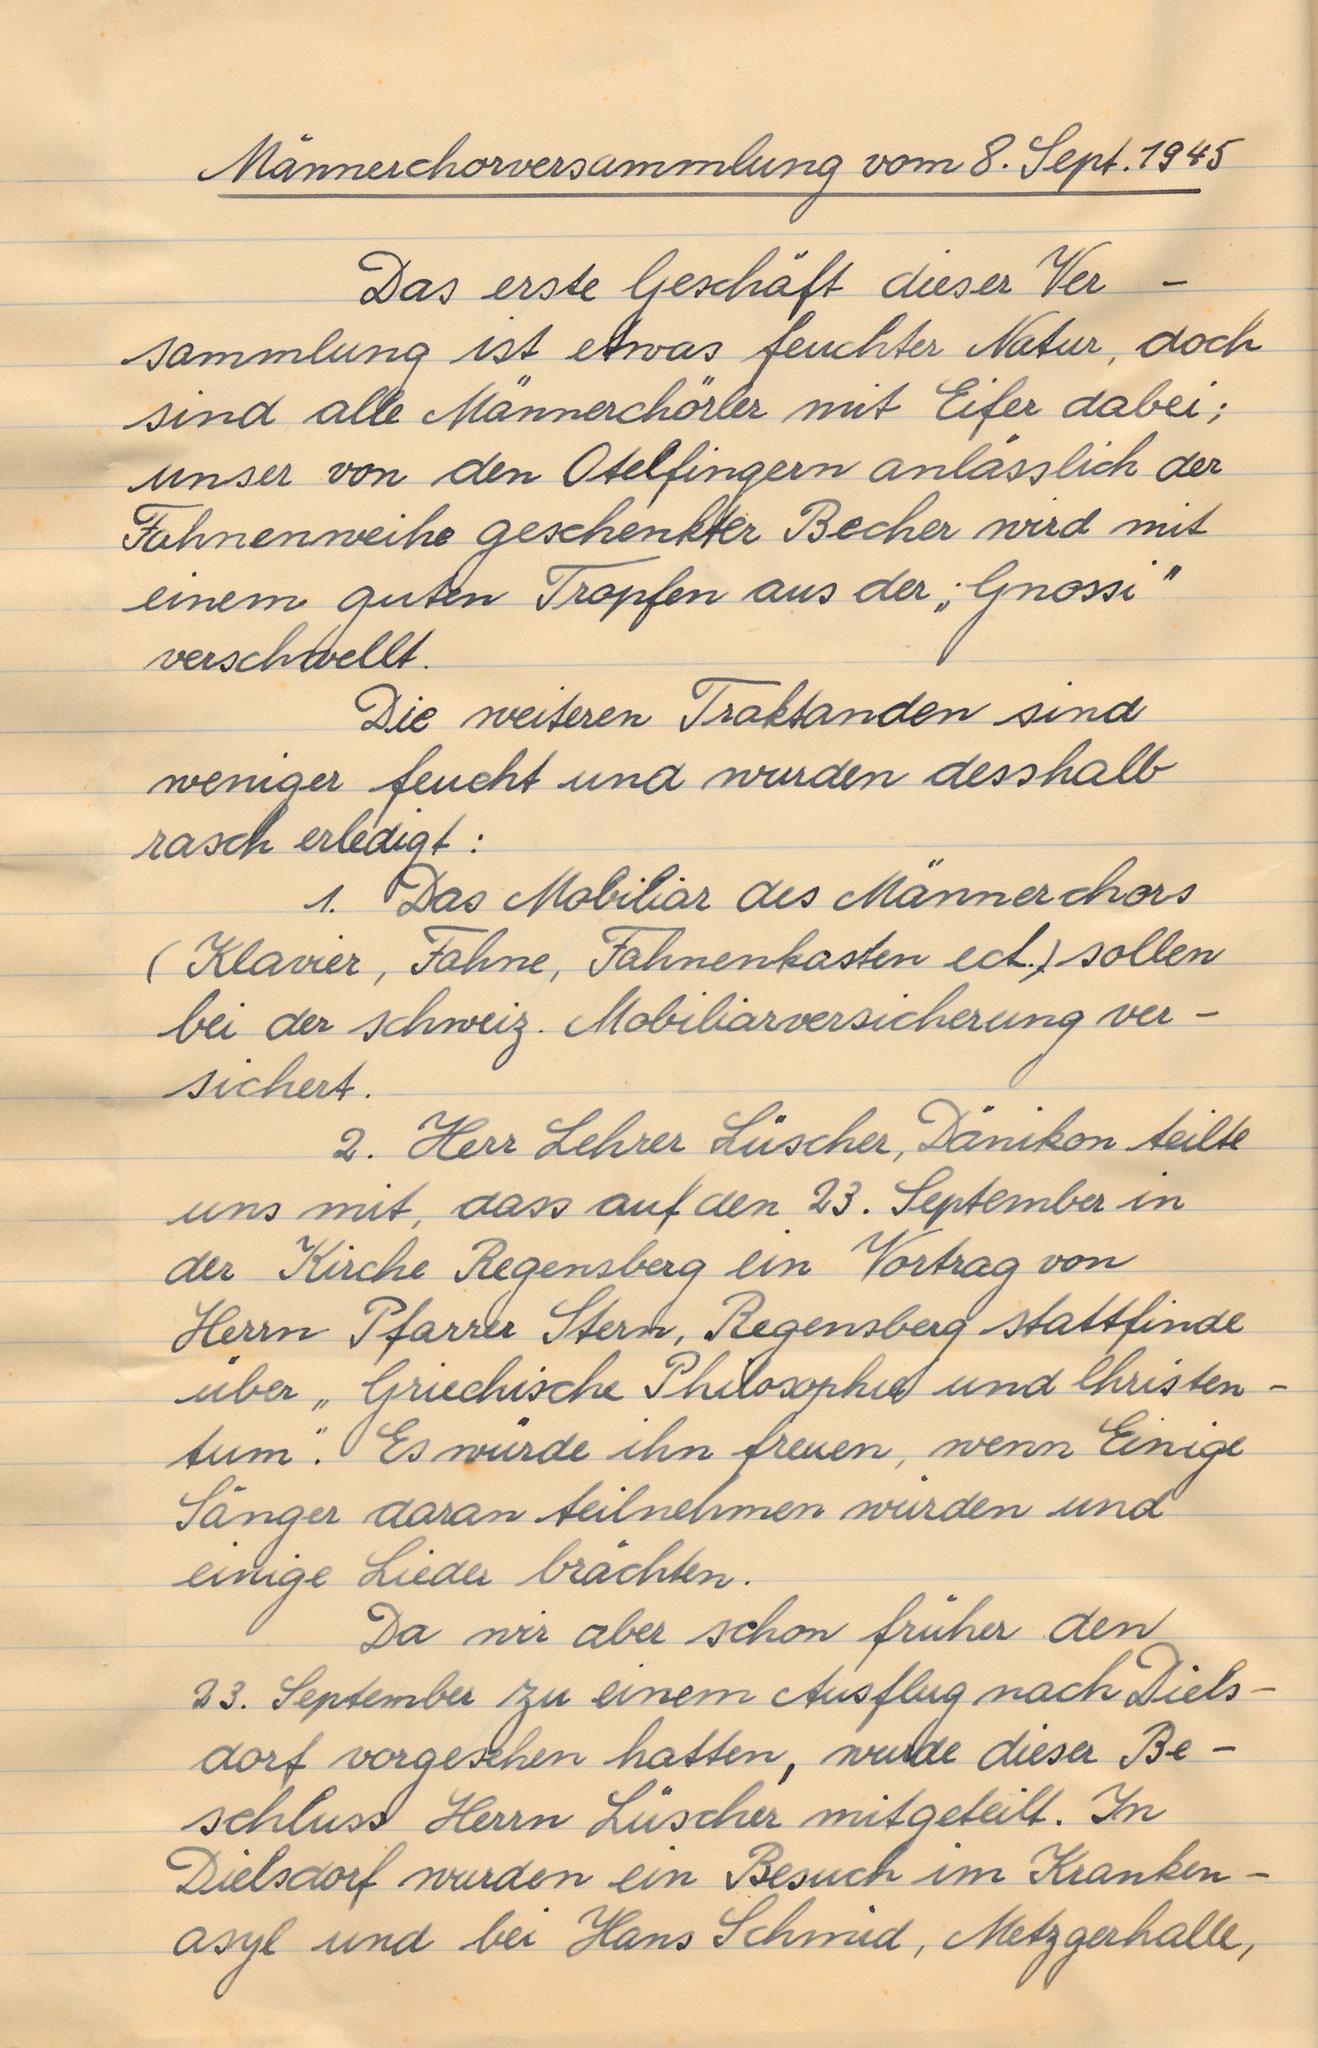 Nachträge zum Fest::Protokoll 8. Sept. 1945